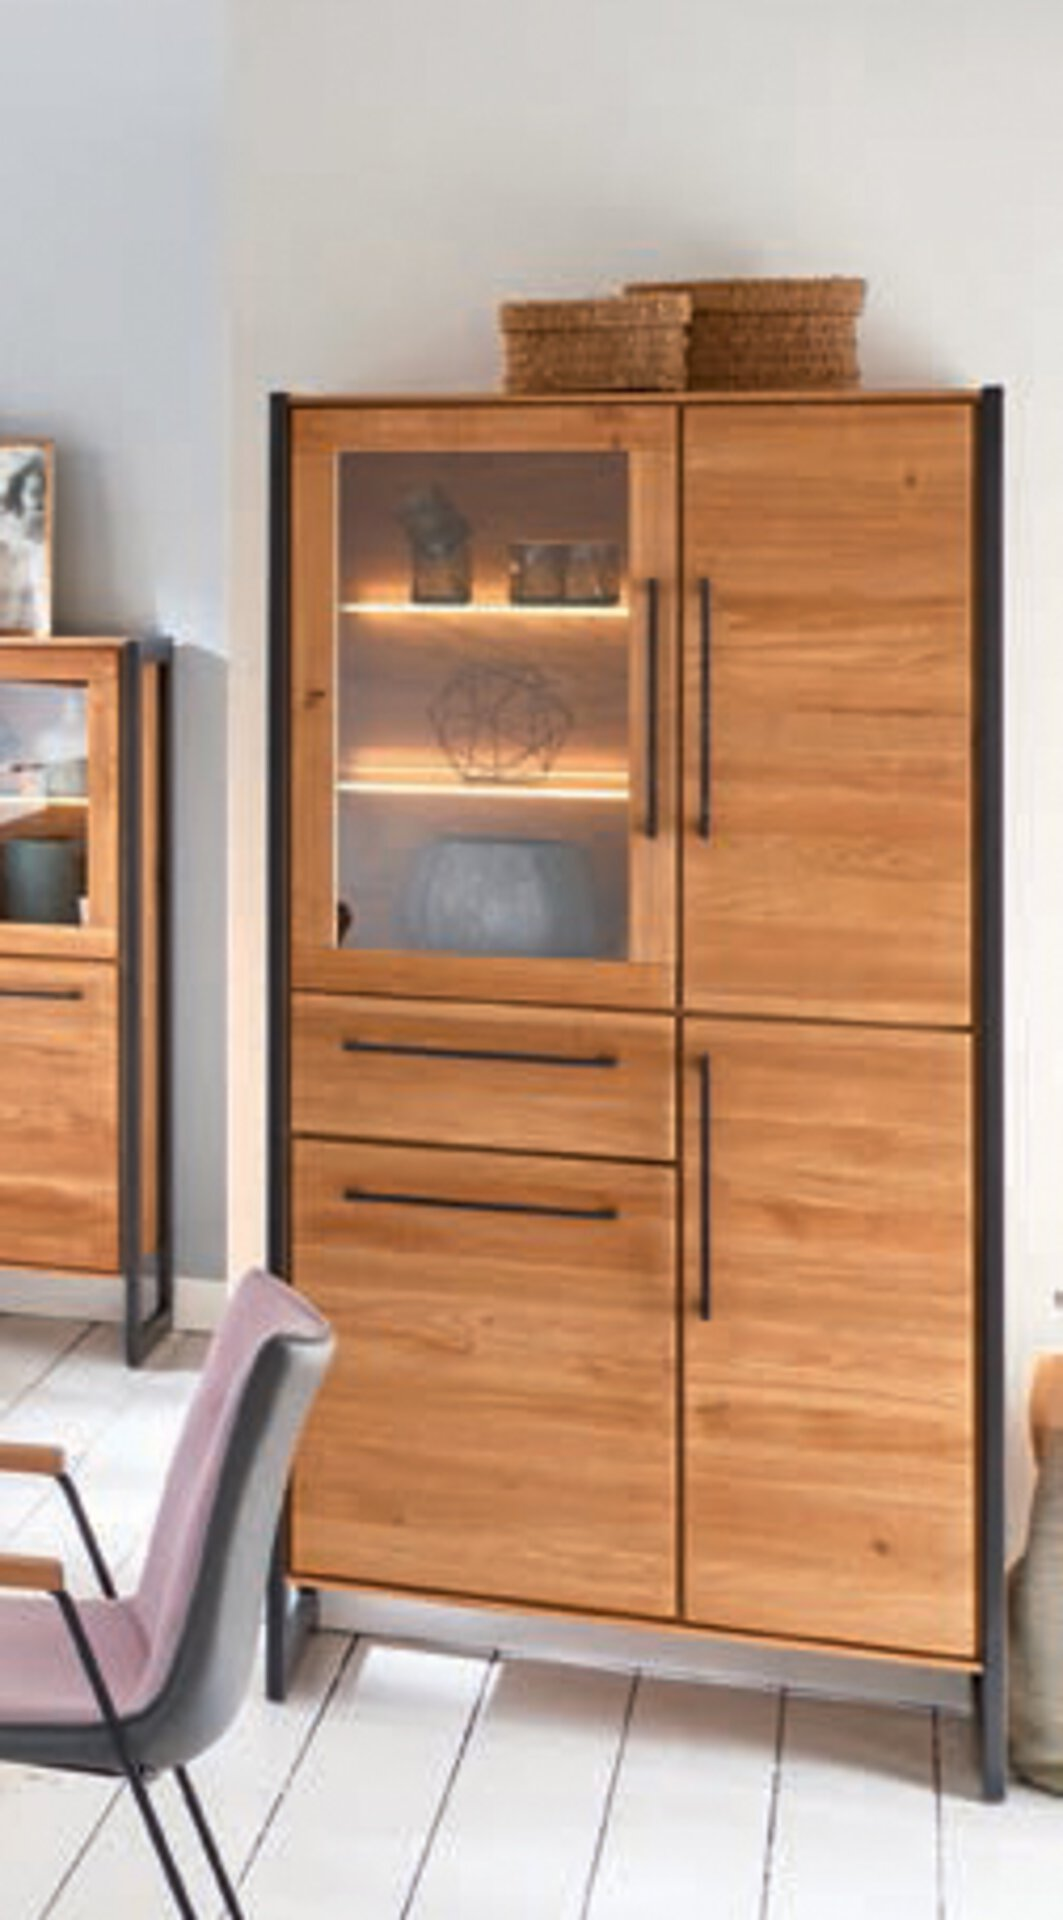 Vitrine NAMUR VALMONDO Holz mehrfarbig 42 x 188 x 93 cm